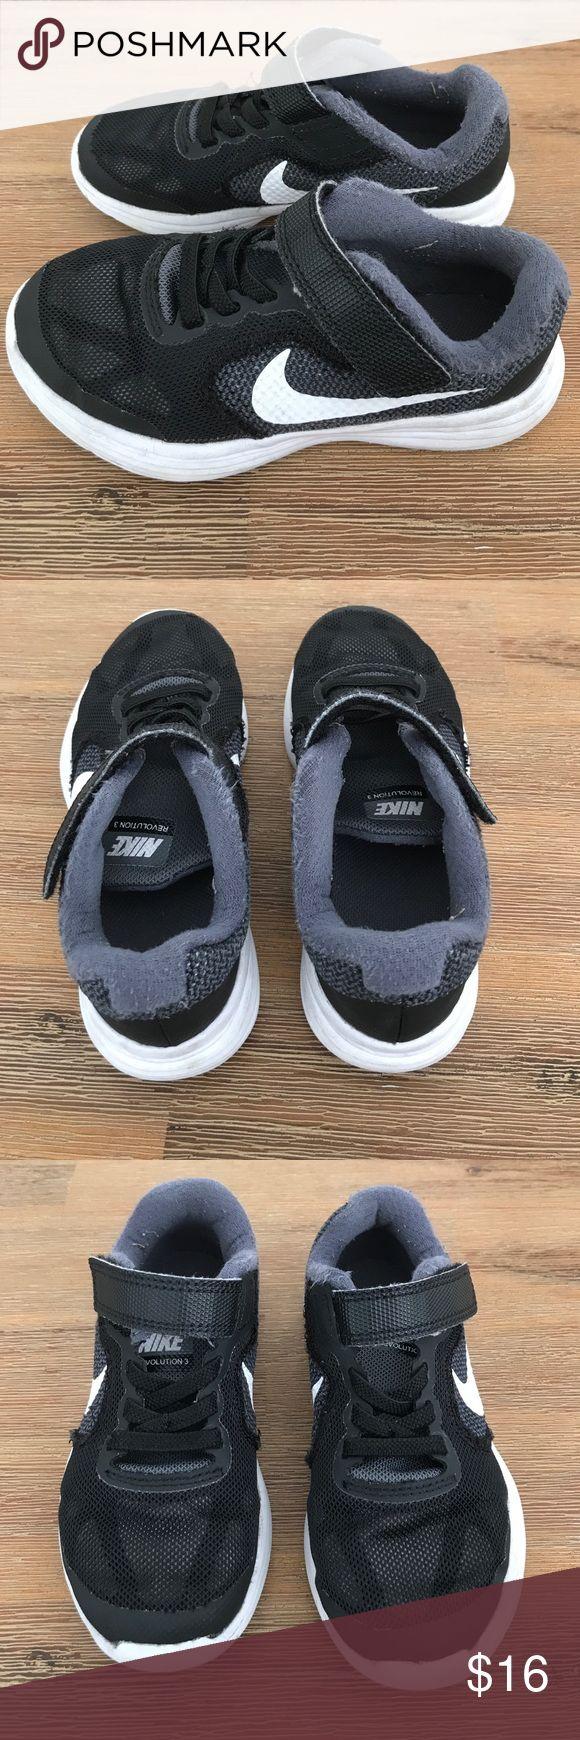 Nike revolution 3 black toddler sneaker size 10.5 Nike revolution 3 black toddler sneaker size 10.5 Nike Shoes Sneakers